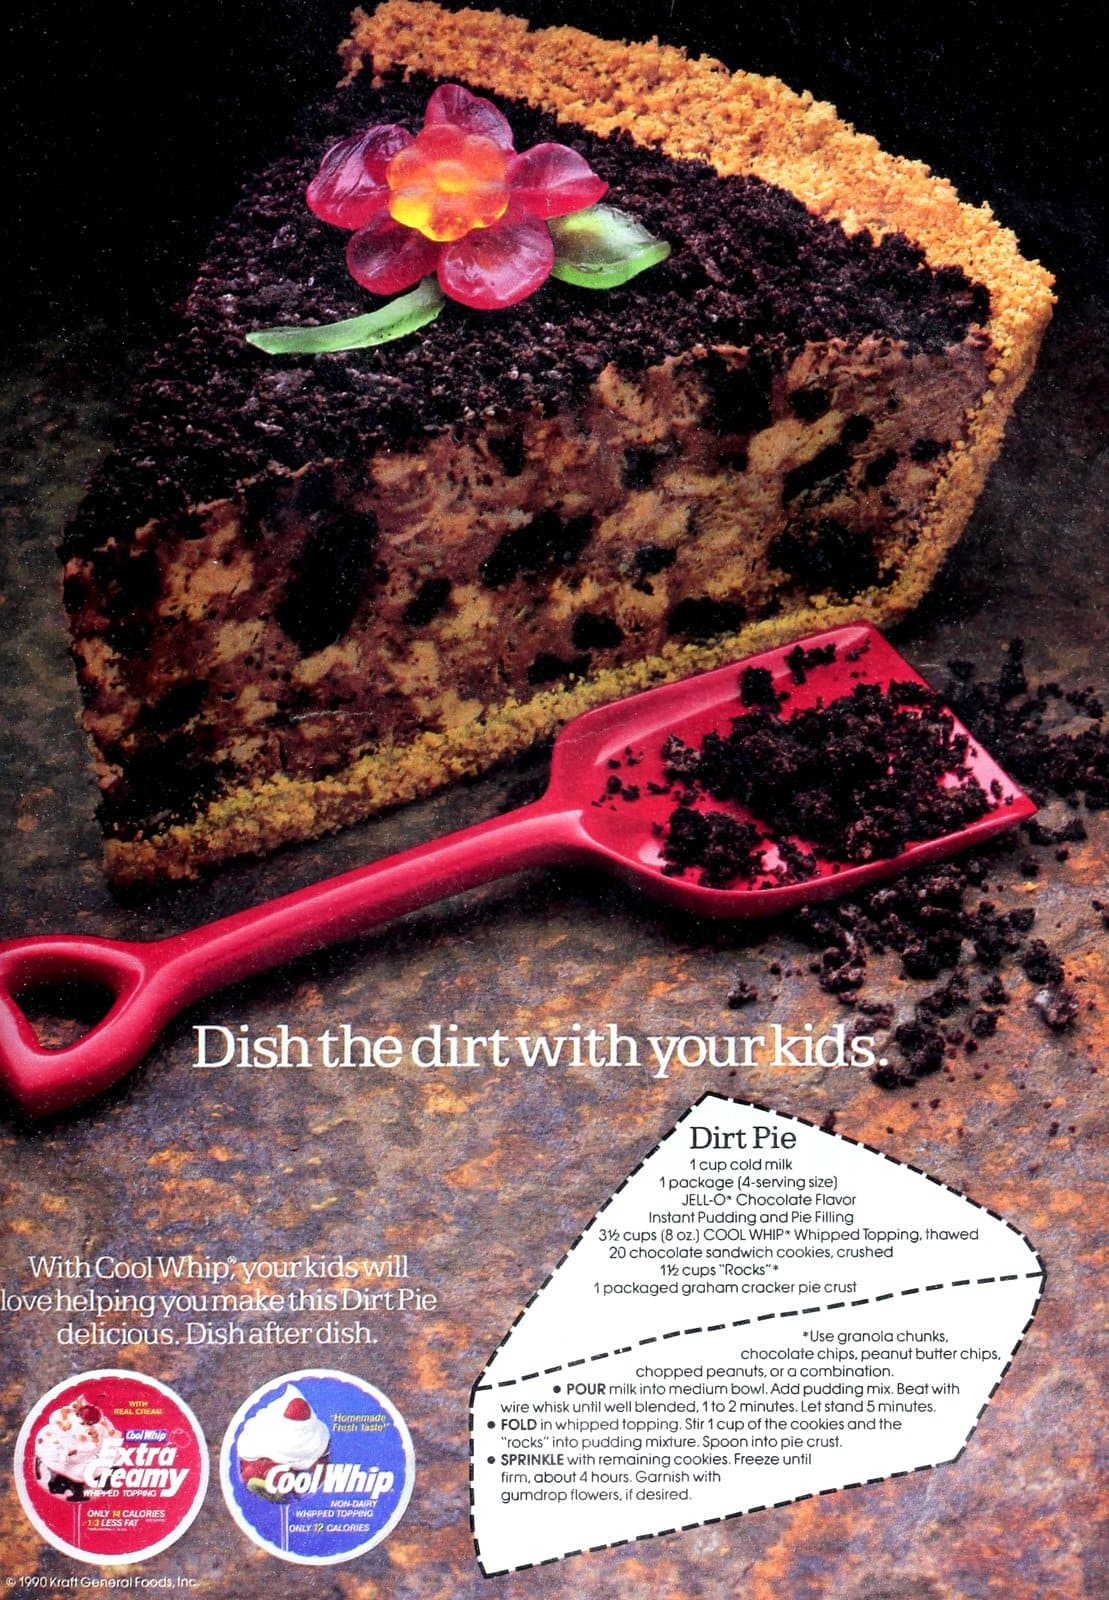 Vintage Dirt Pie recipe from 1990